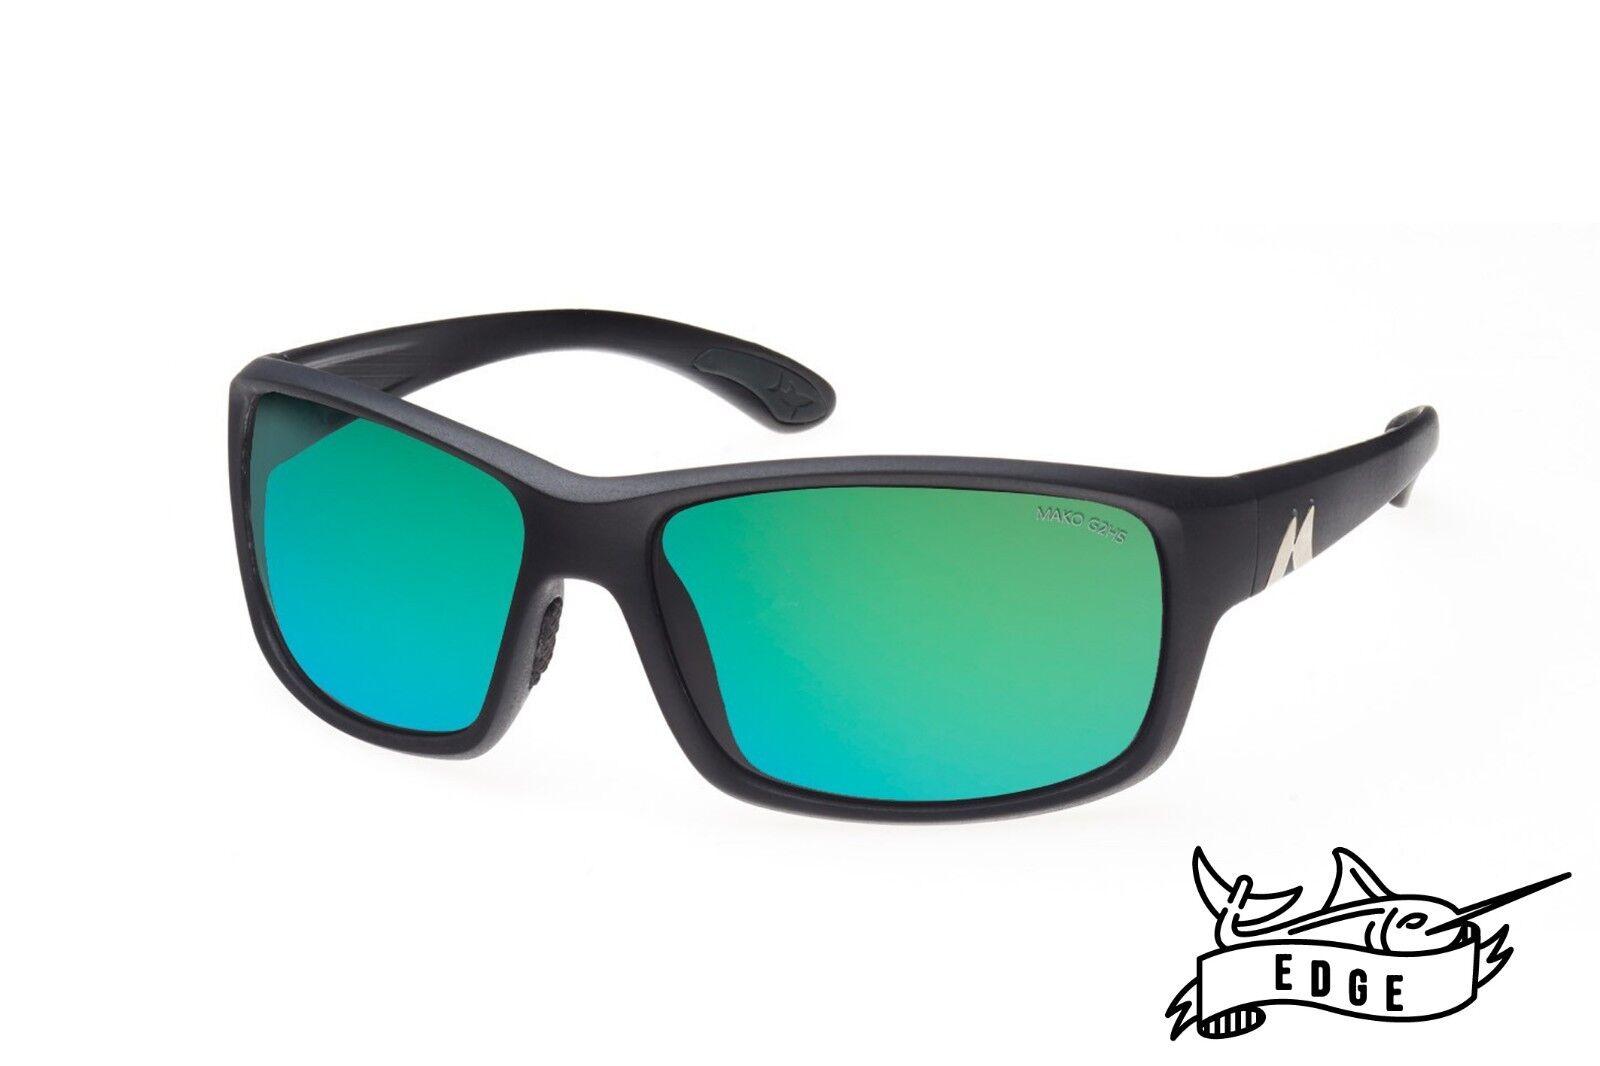 Mako EDGE- pink Glass Green Mirror Sunglasses Polarised MO1 9604 G2H5 + Shirt